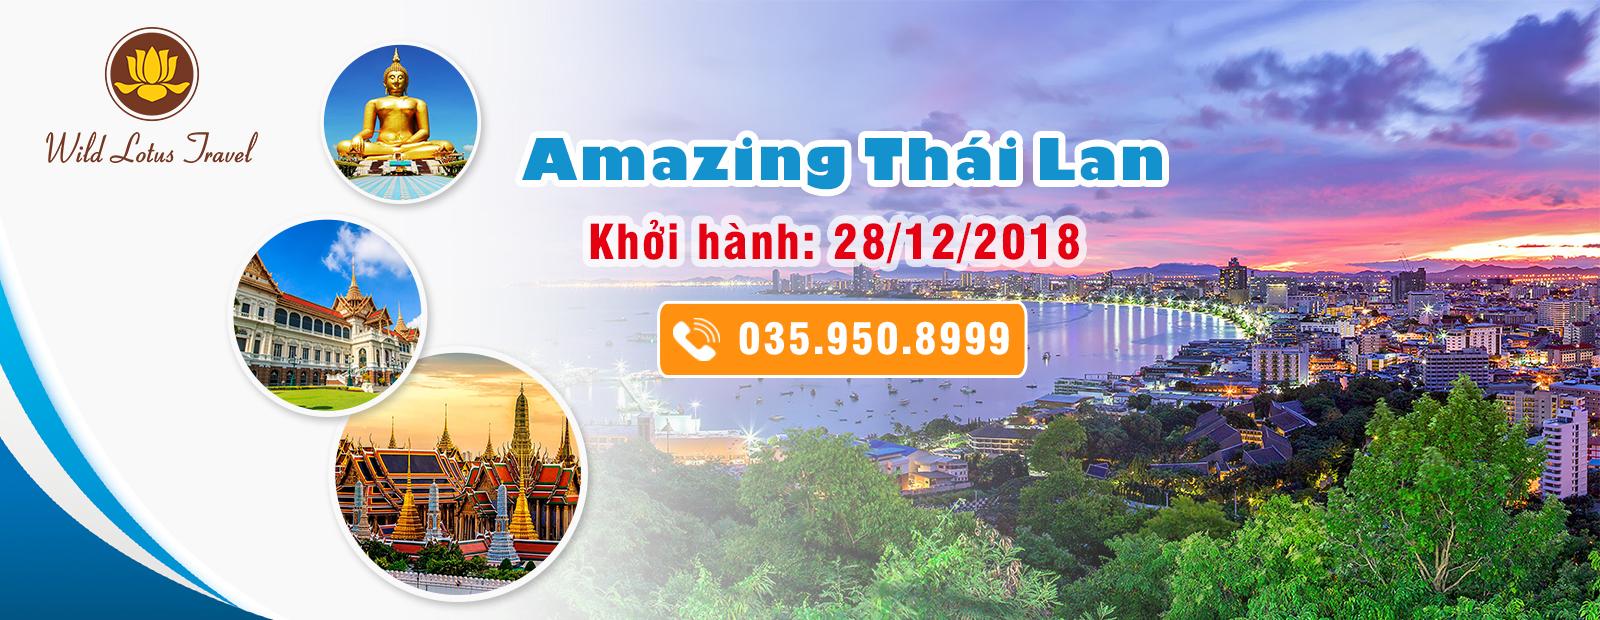 banner01_Thailandhttpswww.wildlotustravel.com_.vntouramazing-thai-lan-tet-duong-lich-2019-khoi-hanh-tu-ha-noi